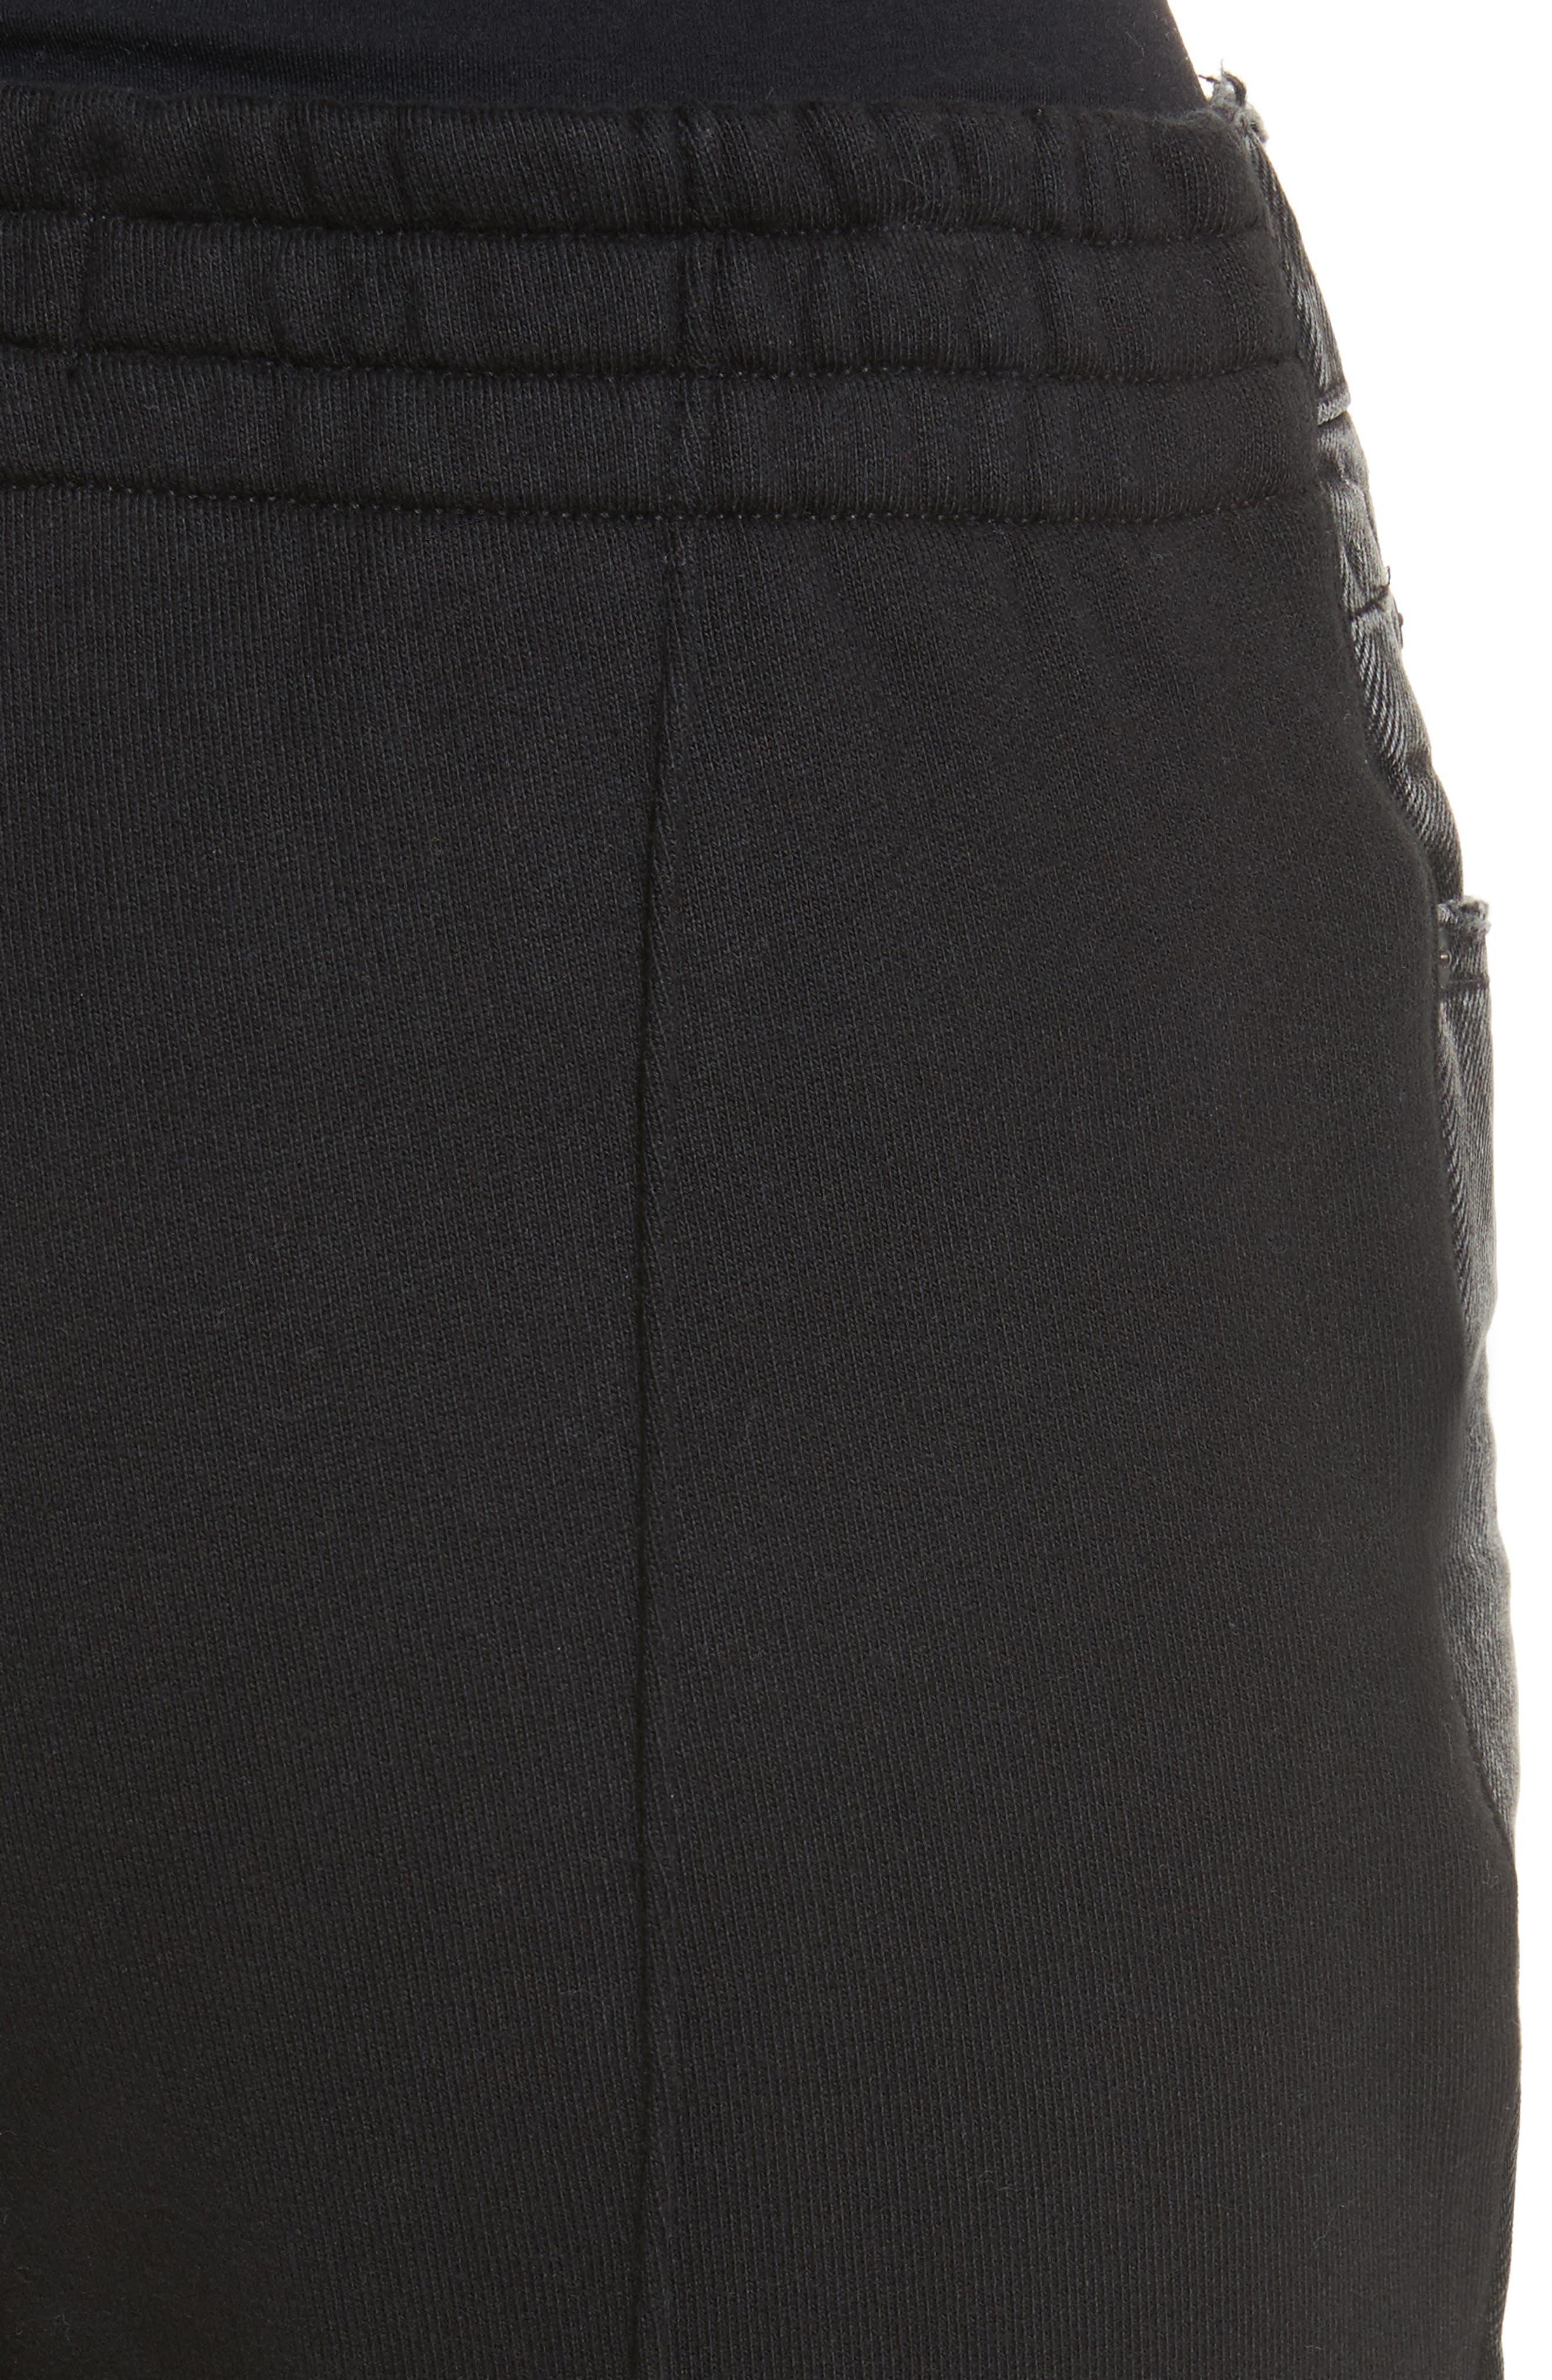 Denim x Alexander Wang Hybrid Sweatpants Jeans,                             Alternate thumbnail 4, color,                             025